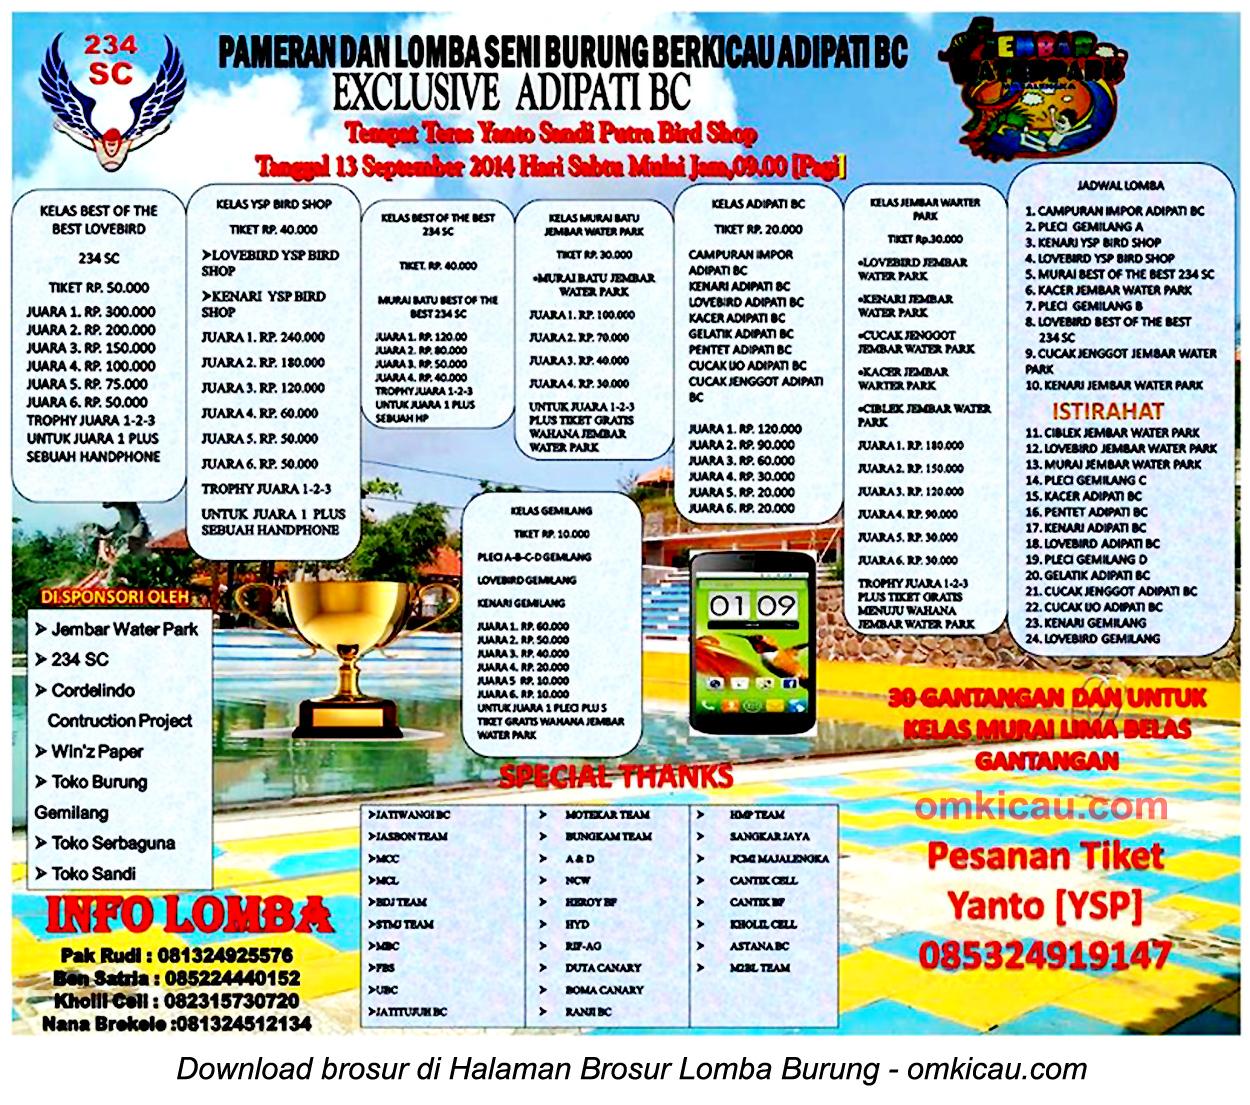 Brosur Lomba Burung Berkicau Exclusive Adipati BC, Majalengka, 13 September 2014